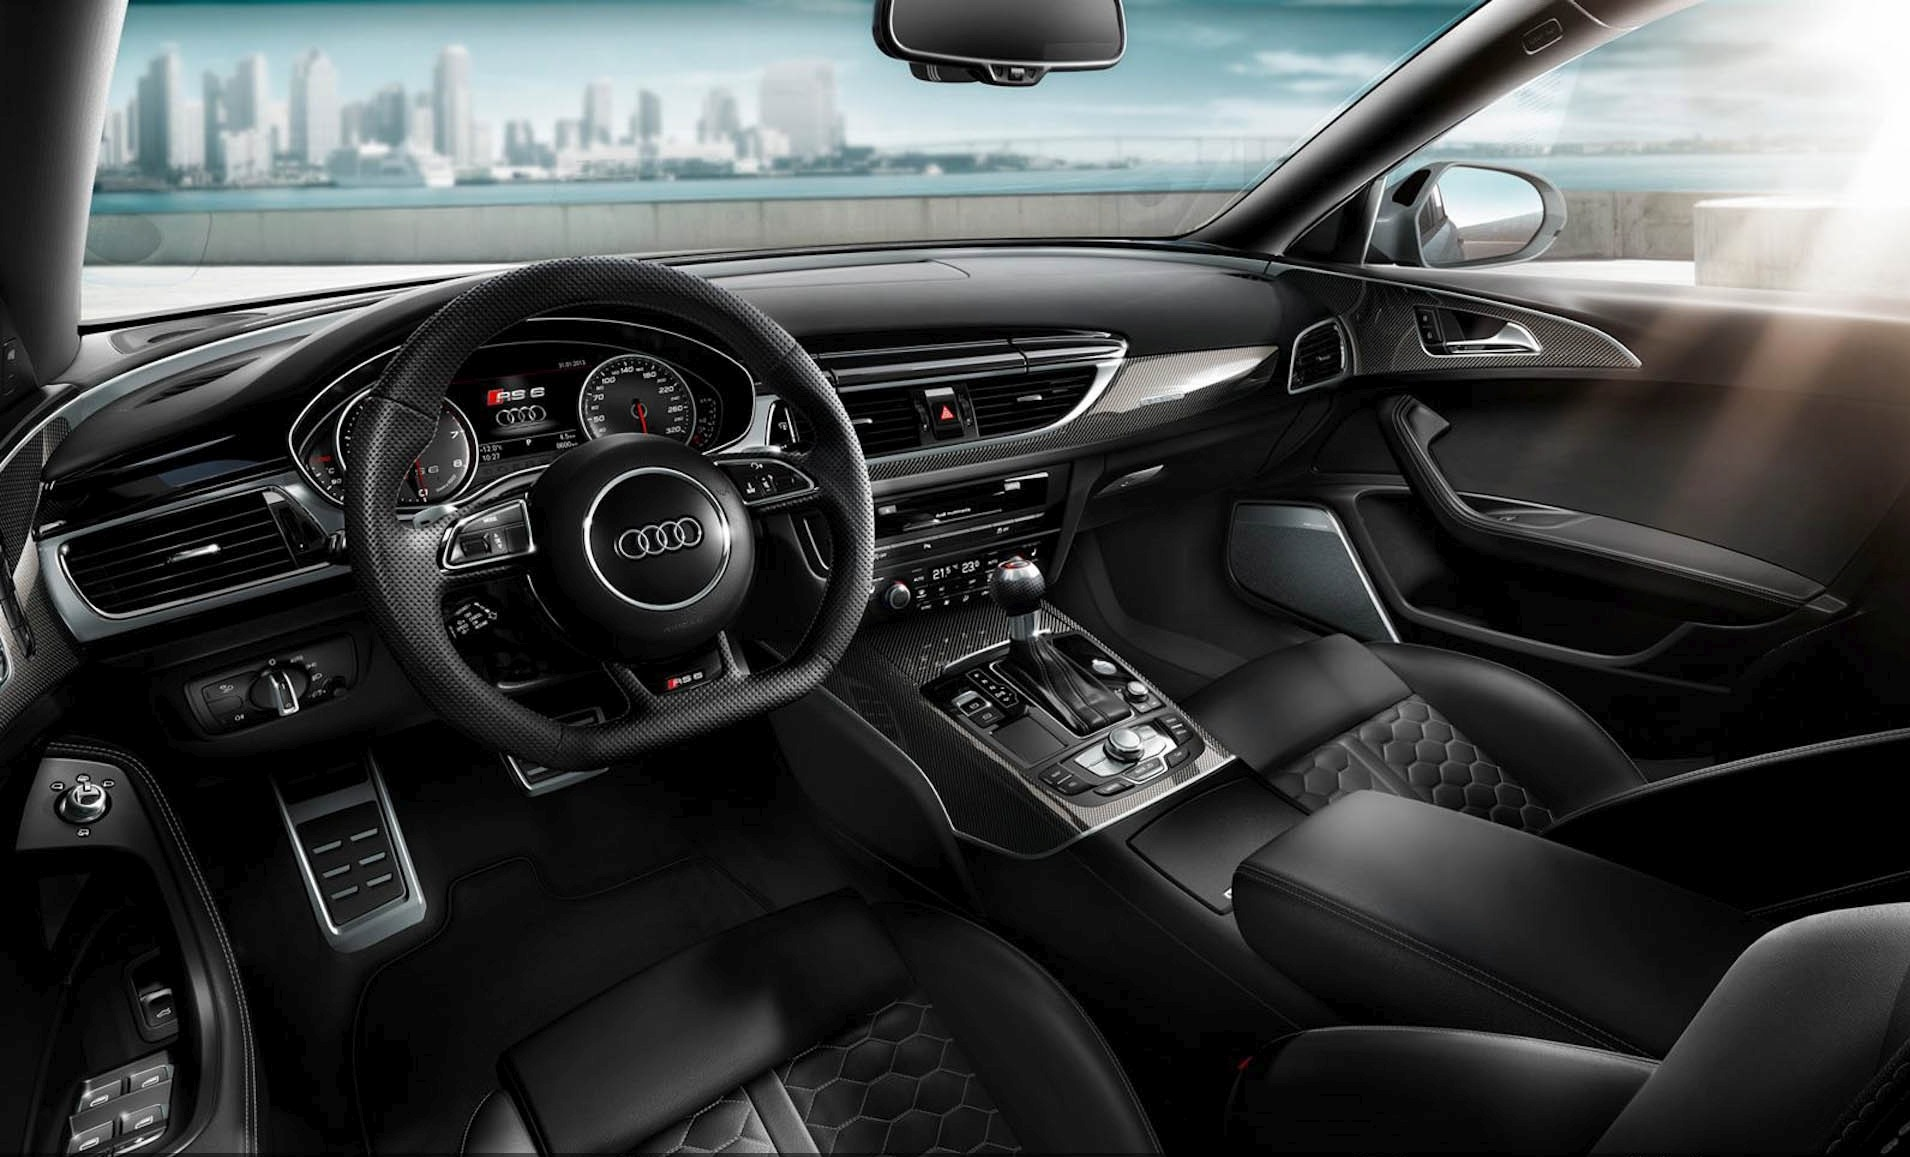 активация дополнительных функций на Audi A4 B8 A5 A6 C7 Q3 Q5